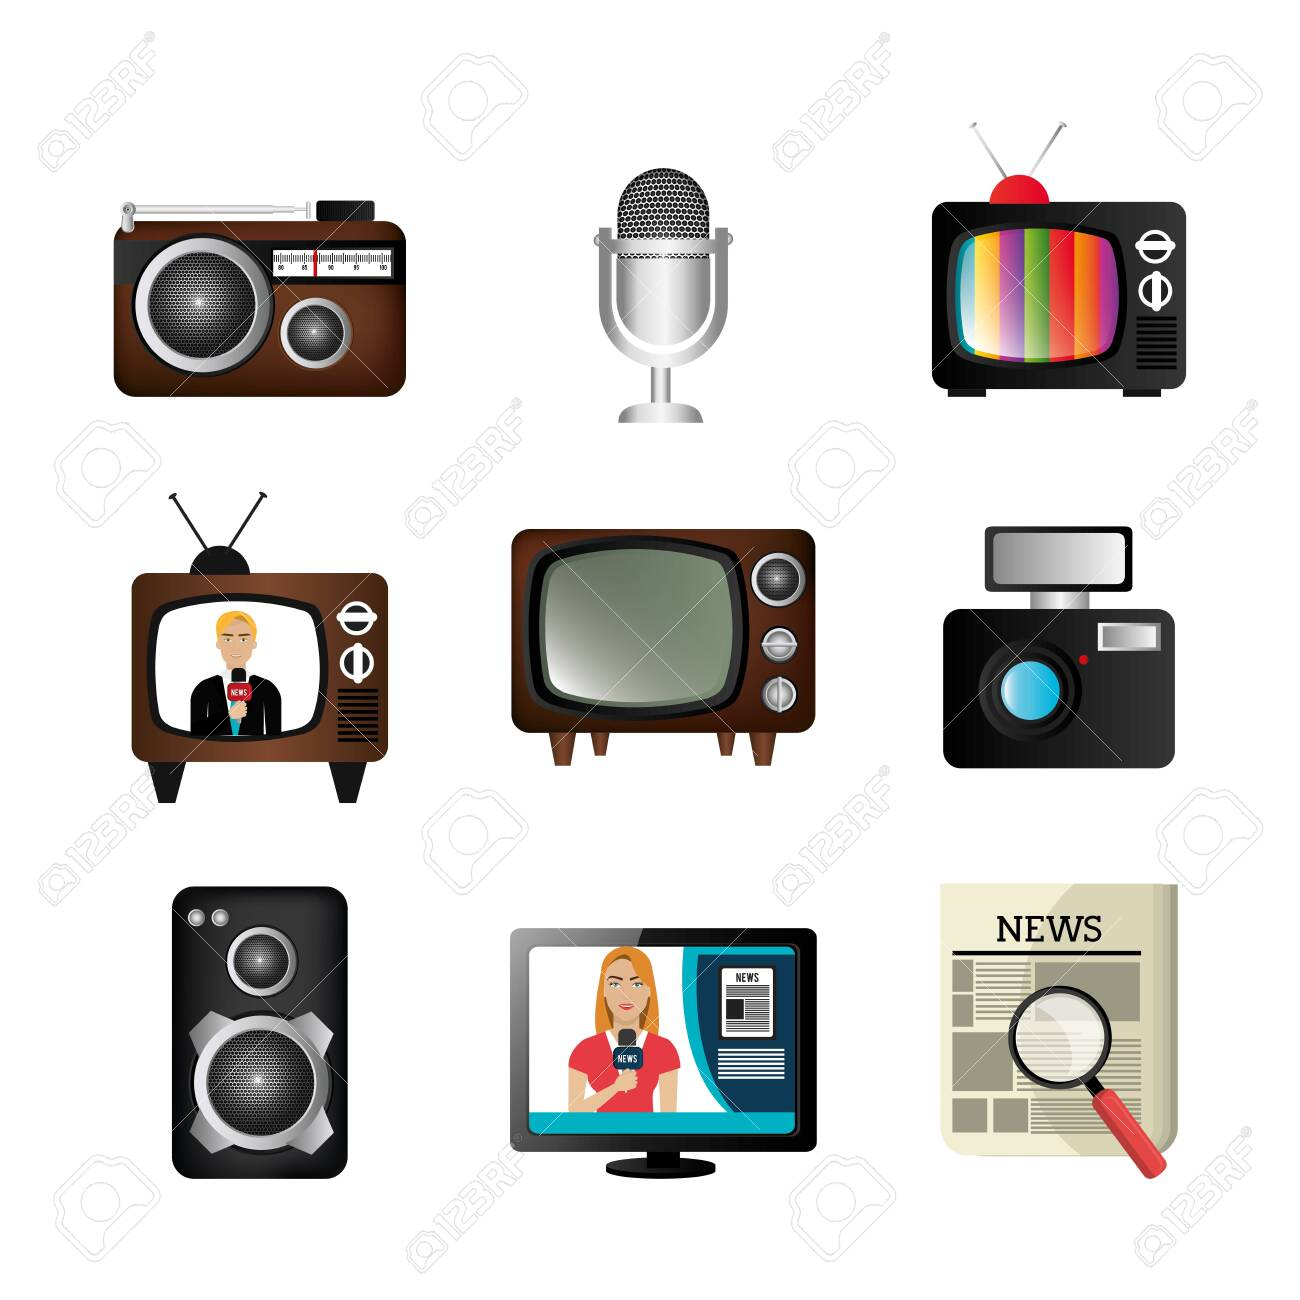 set of news information icons vector illustration design - 139776072